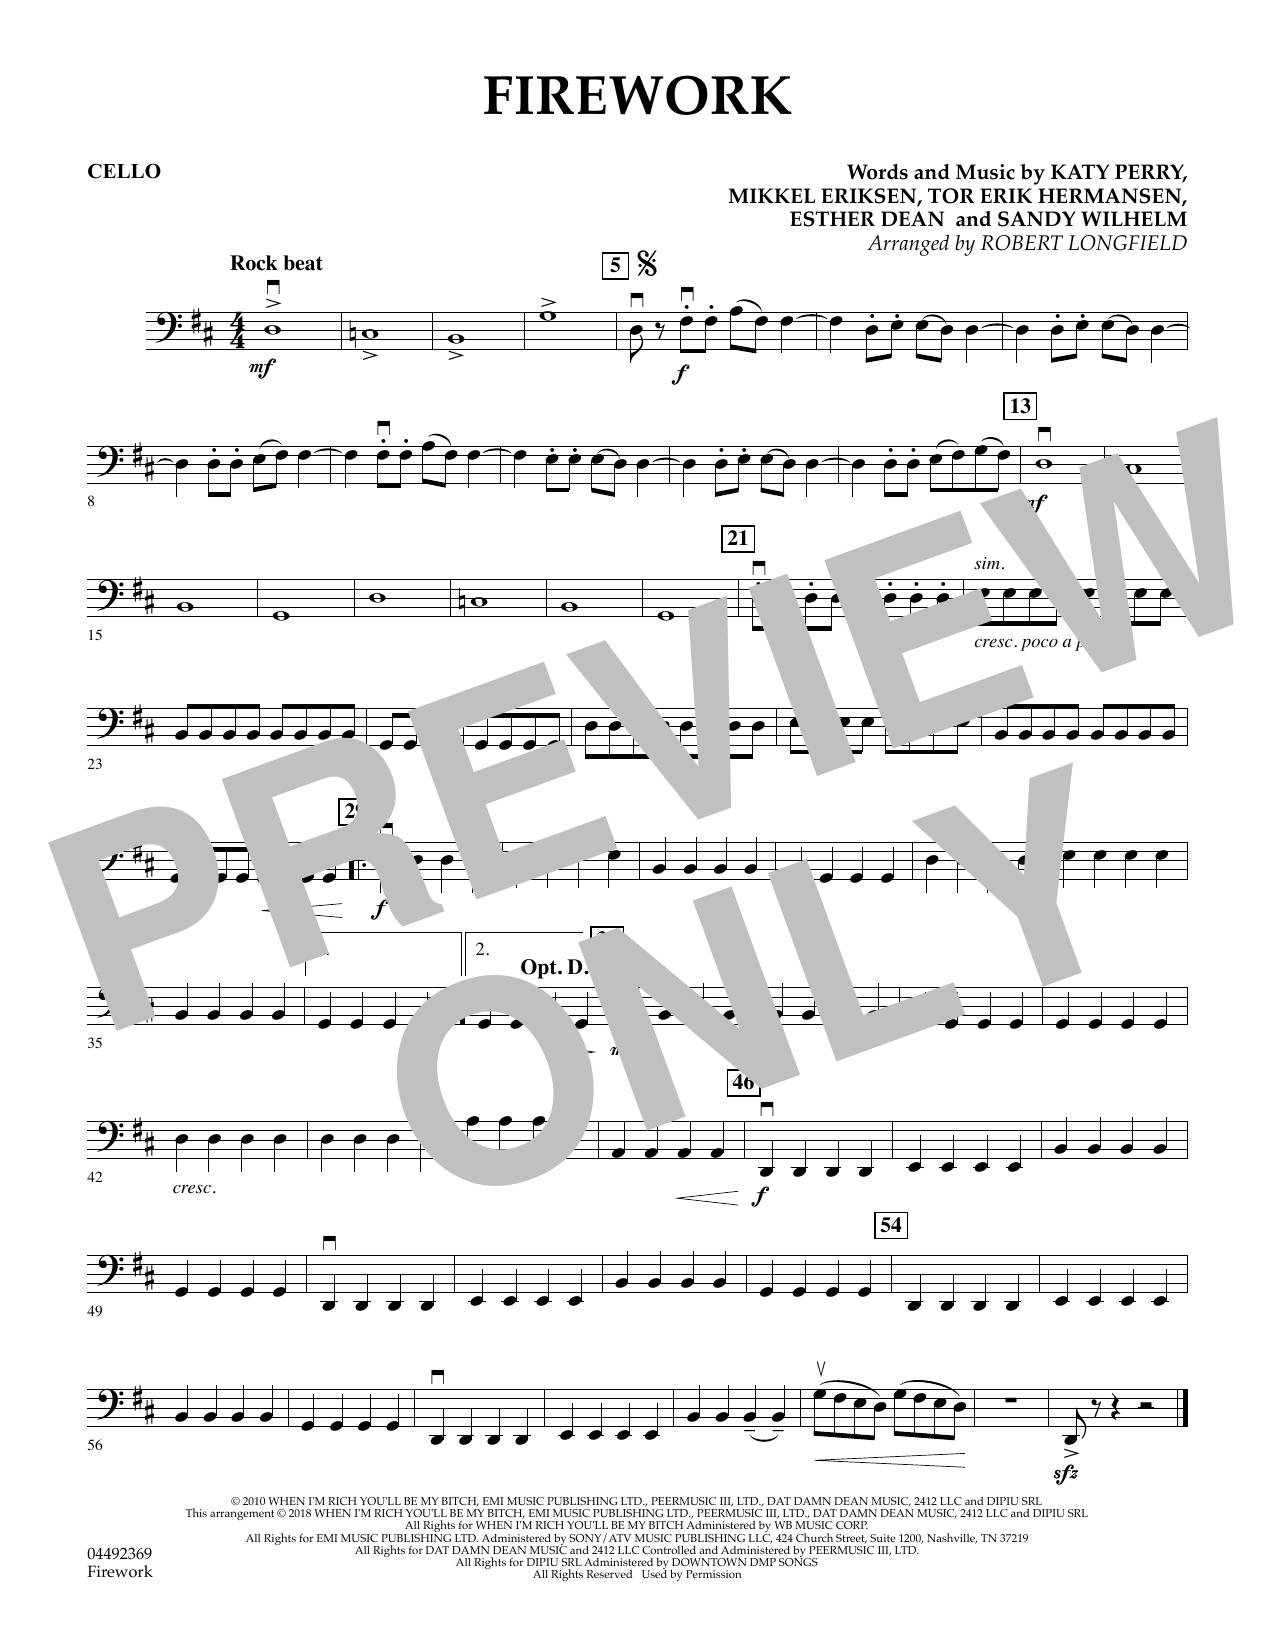 Firework (arr. Robert Longfield) - Cello (Orchestra)